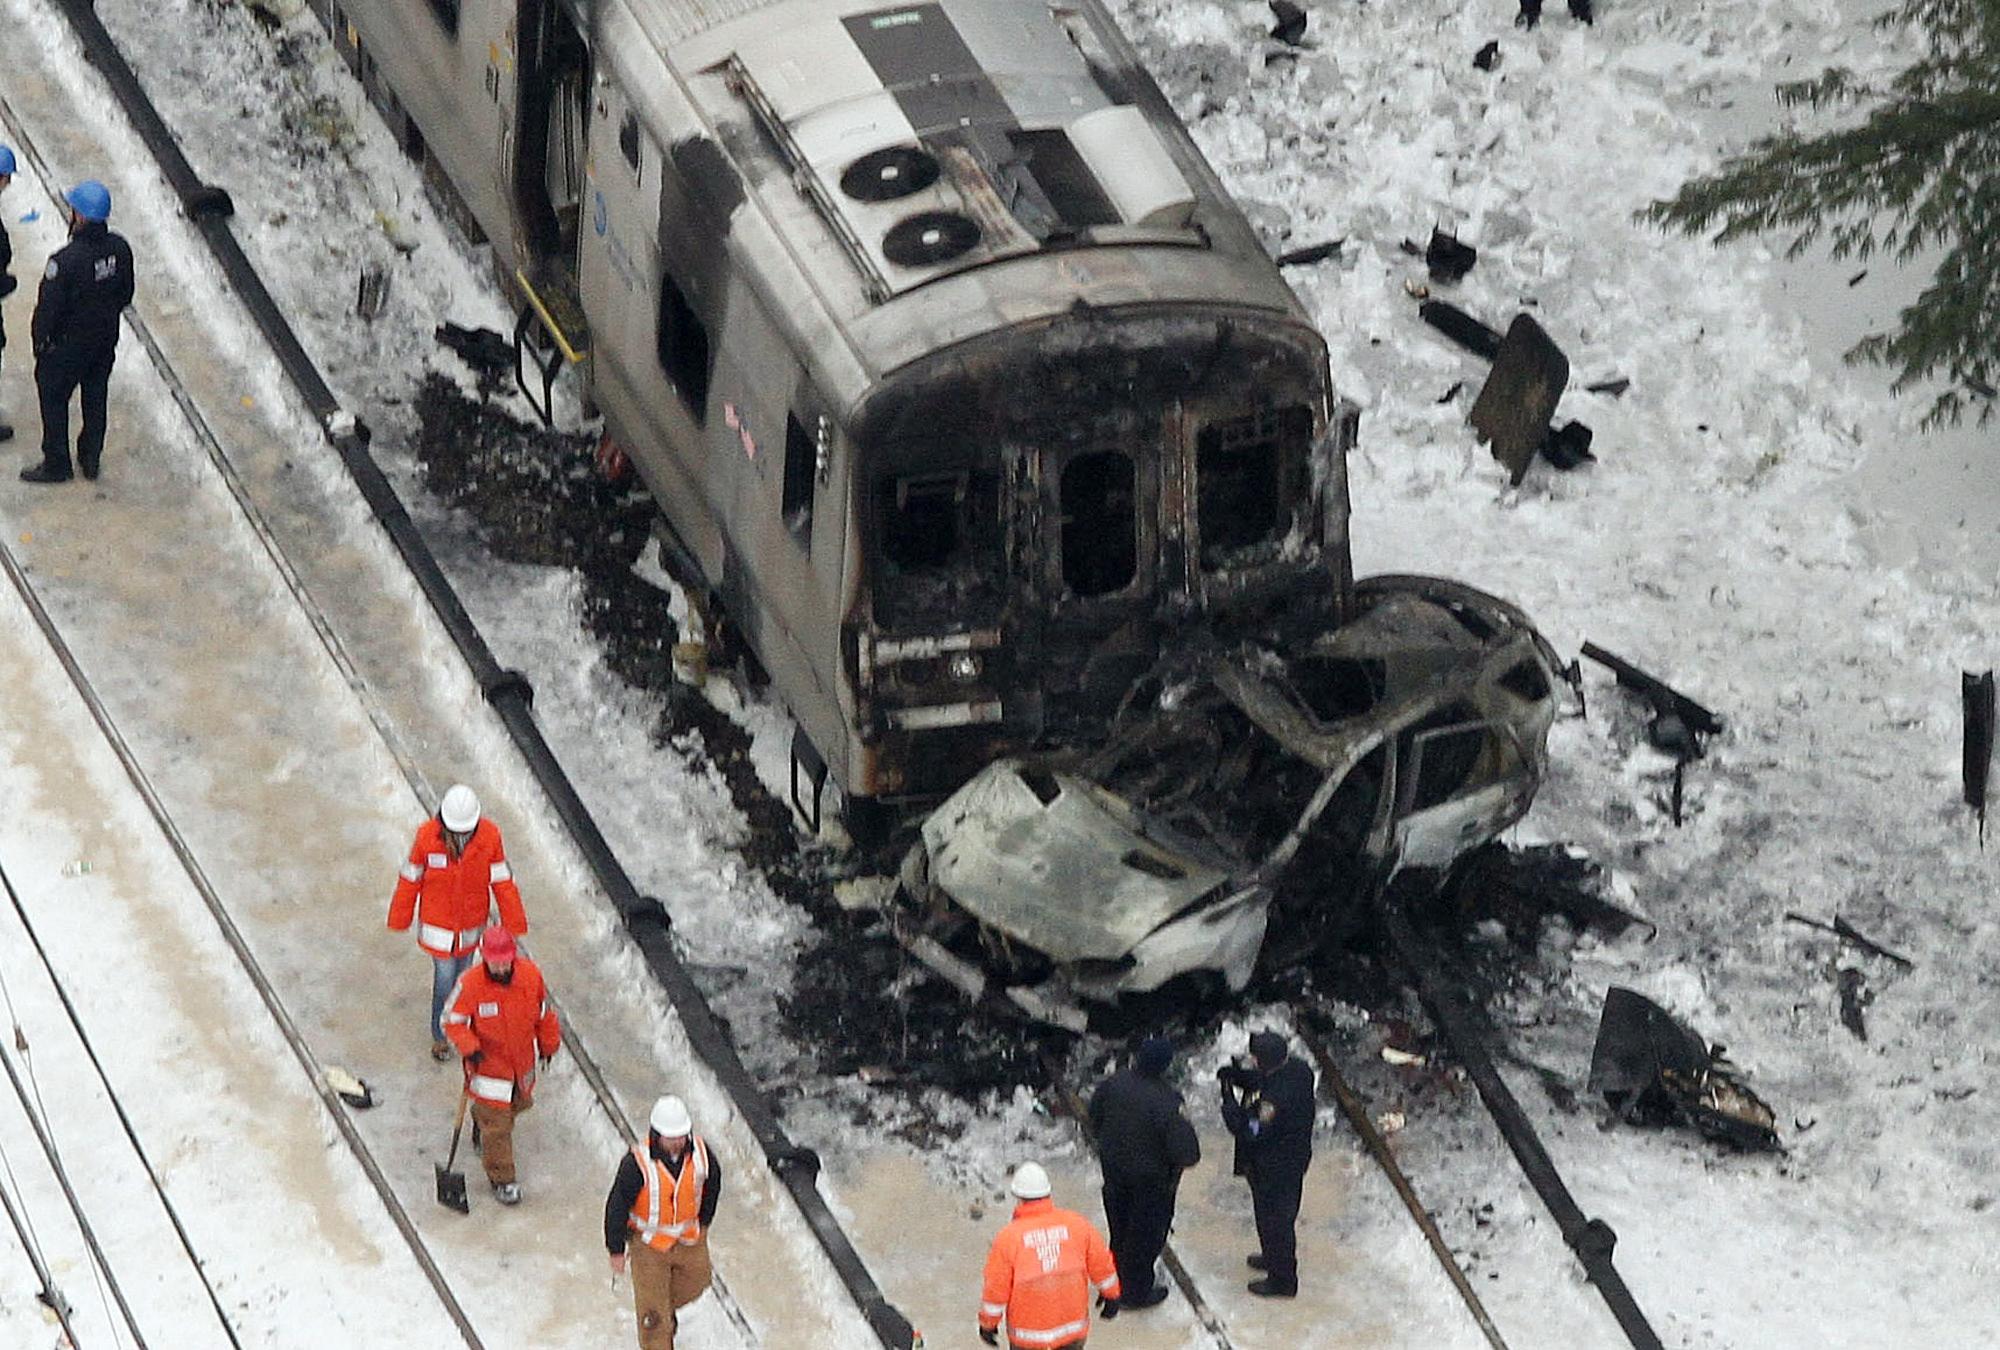 Report: Metro-North train slowed before fatal crash in ...